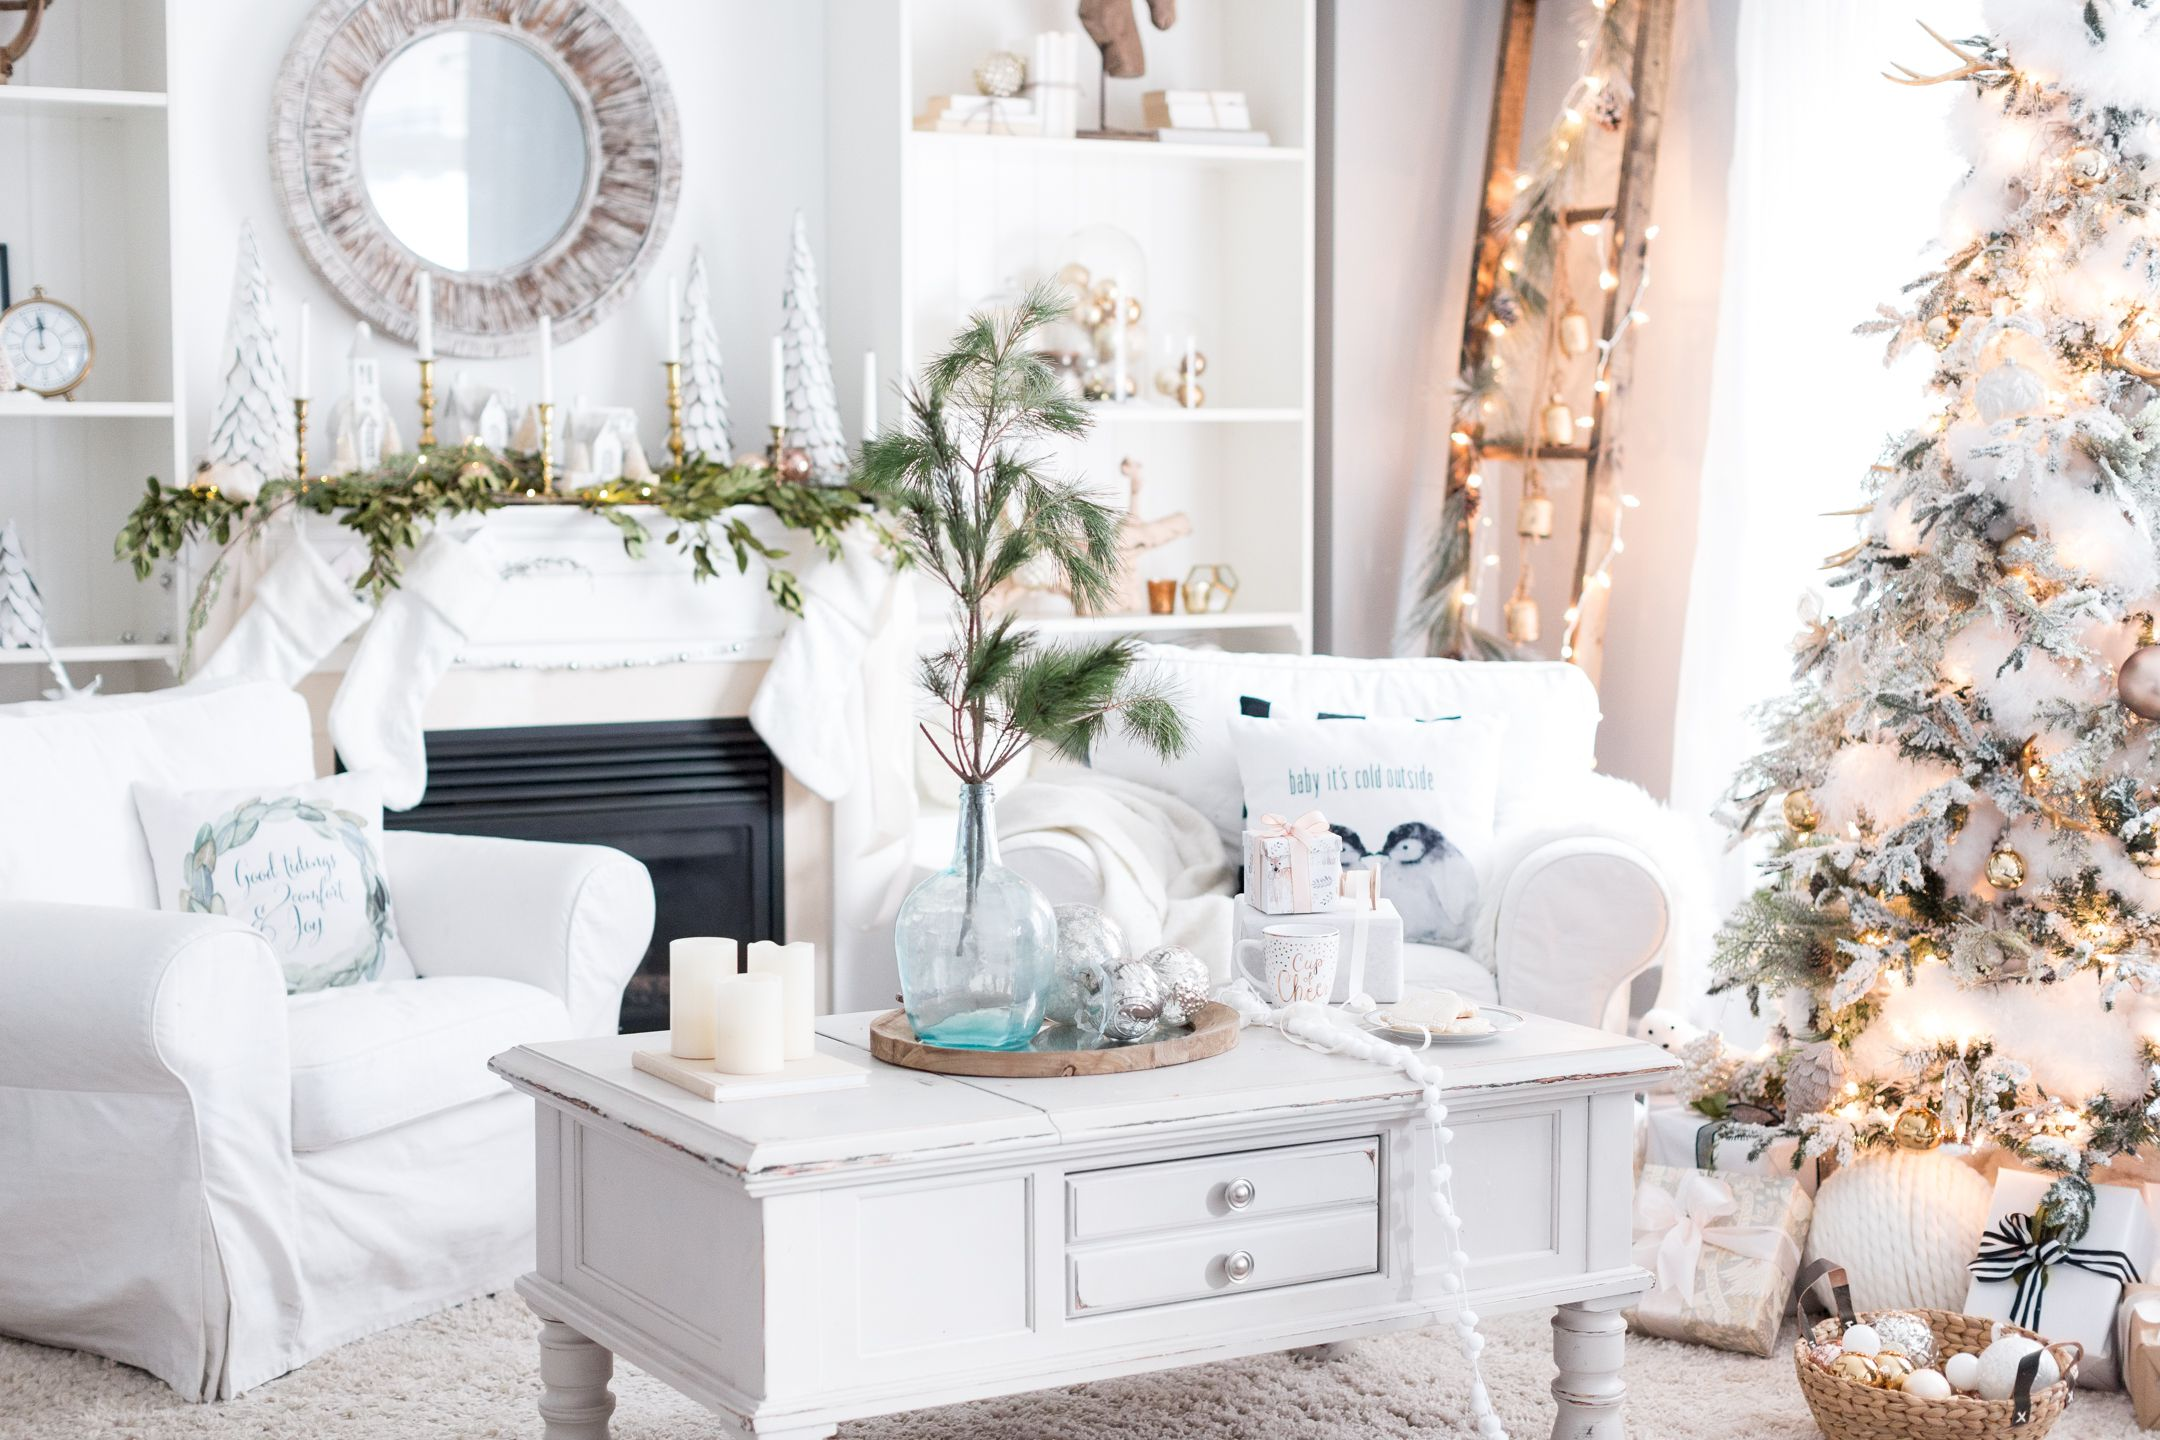 27 Easy Christmas Home Decor Ideas - Small Space Apartment